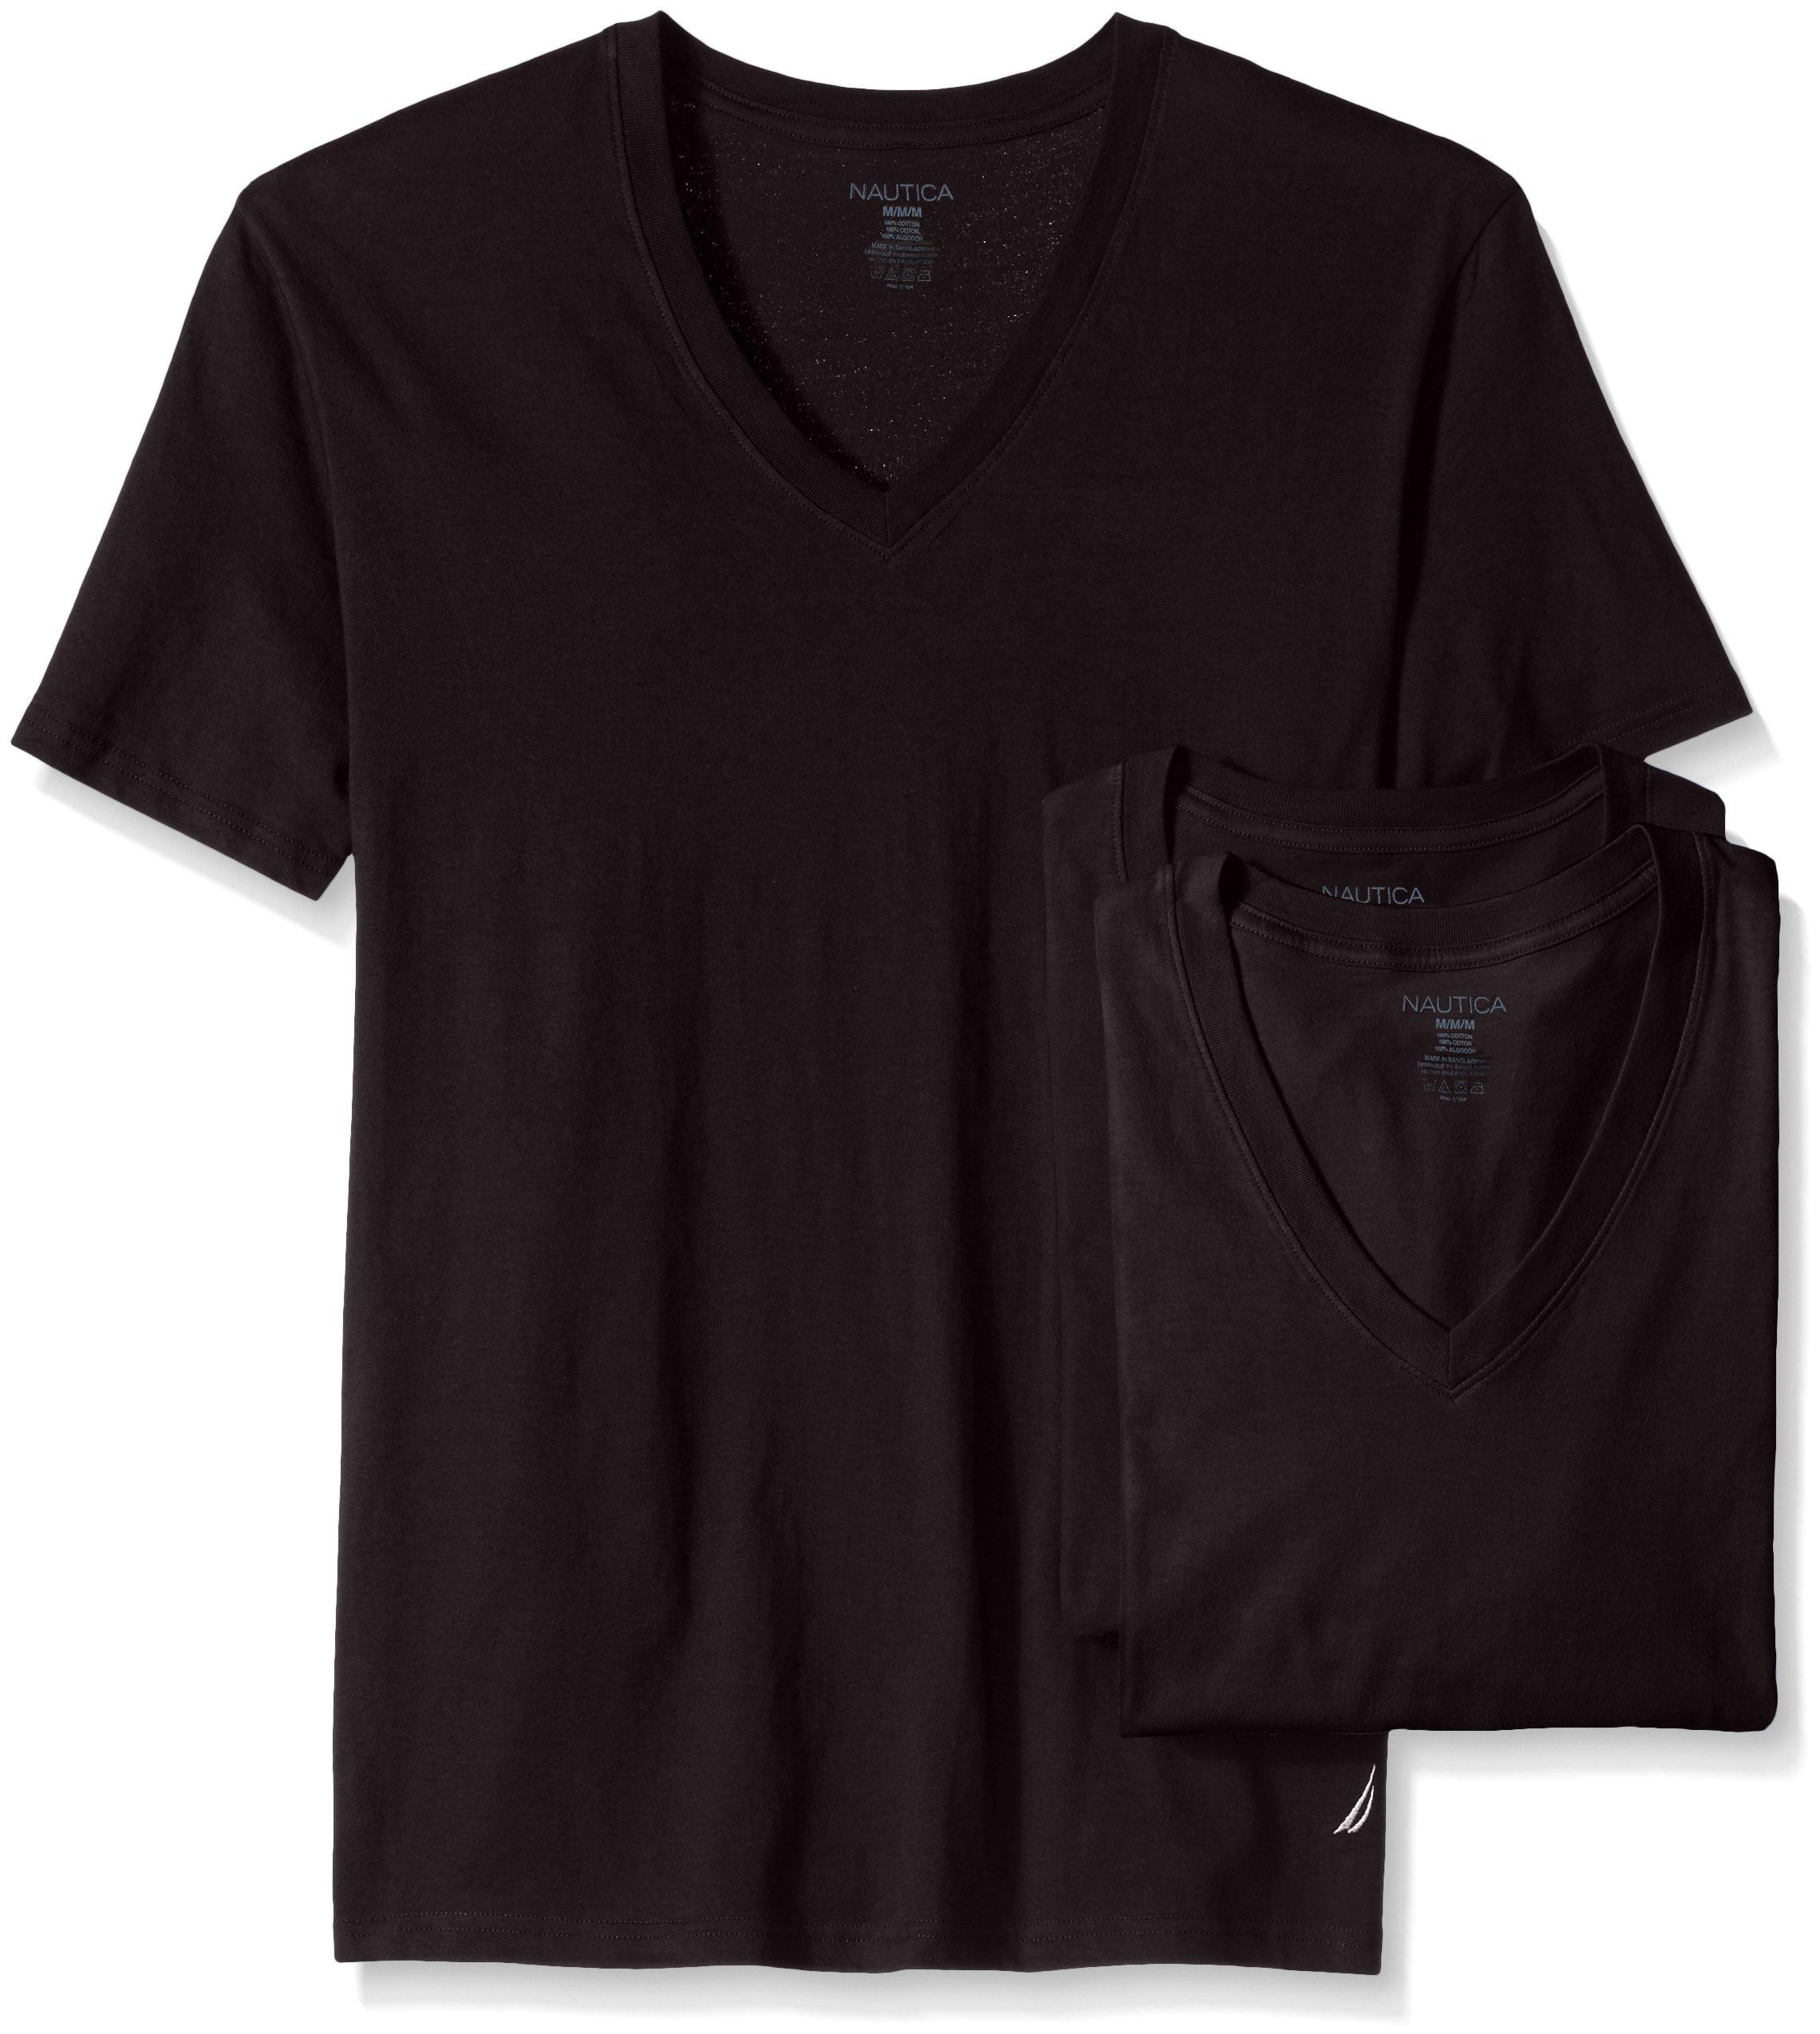 Nautica Men's Cotton V-Neck T-Shirt-Multi Packs, Black-3, S by Nautica